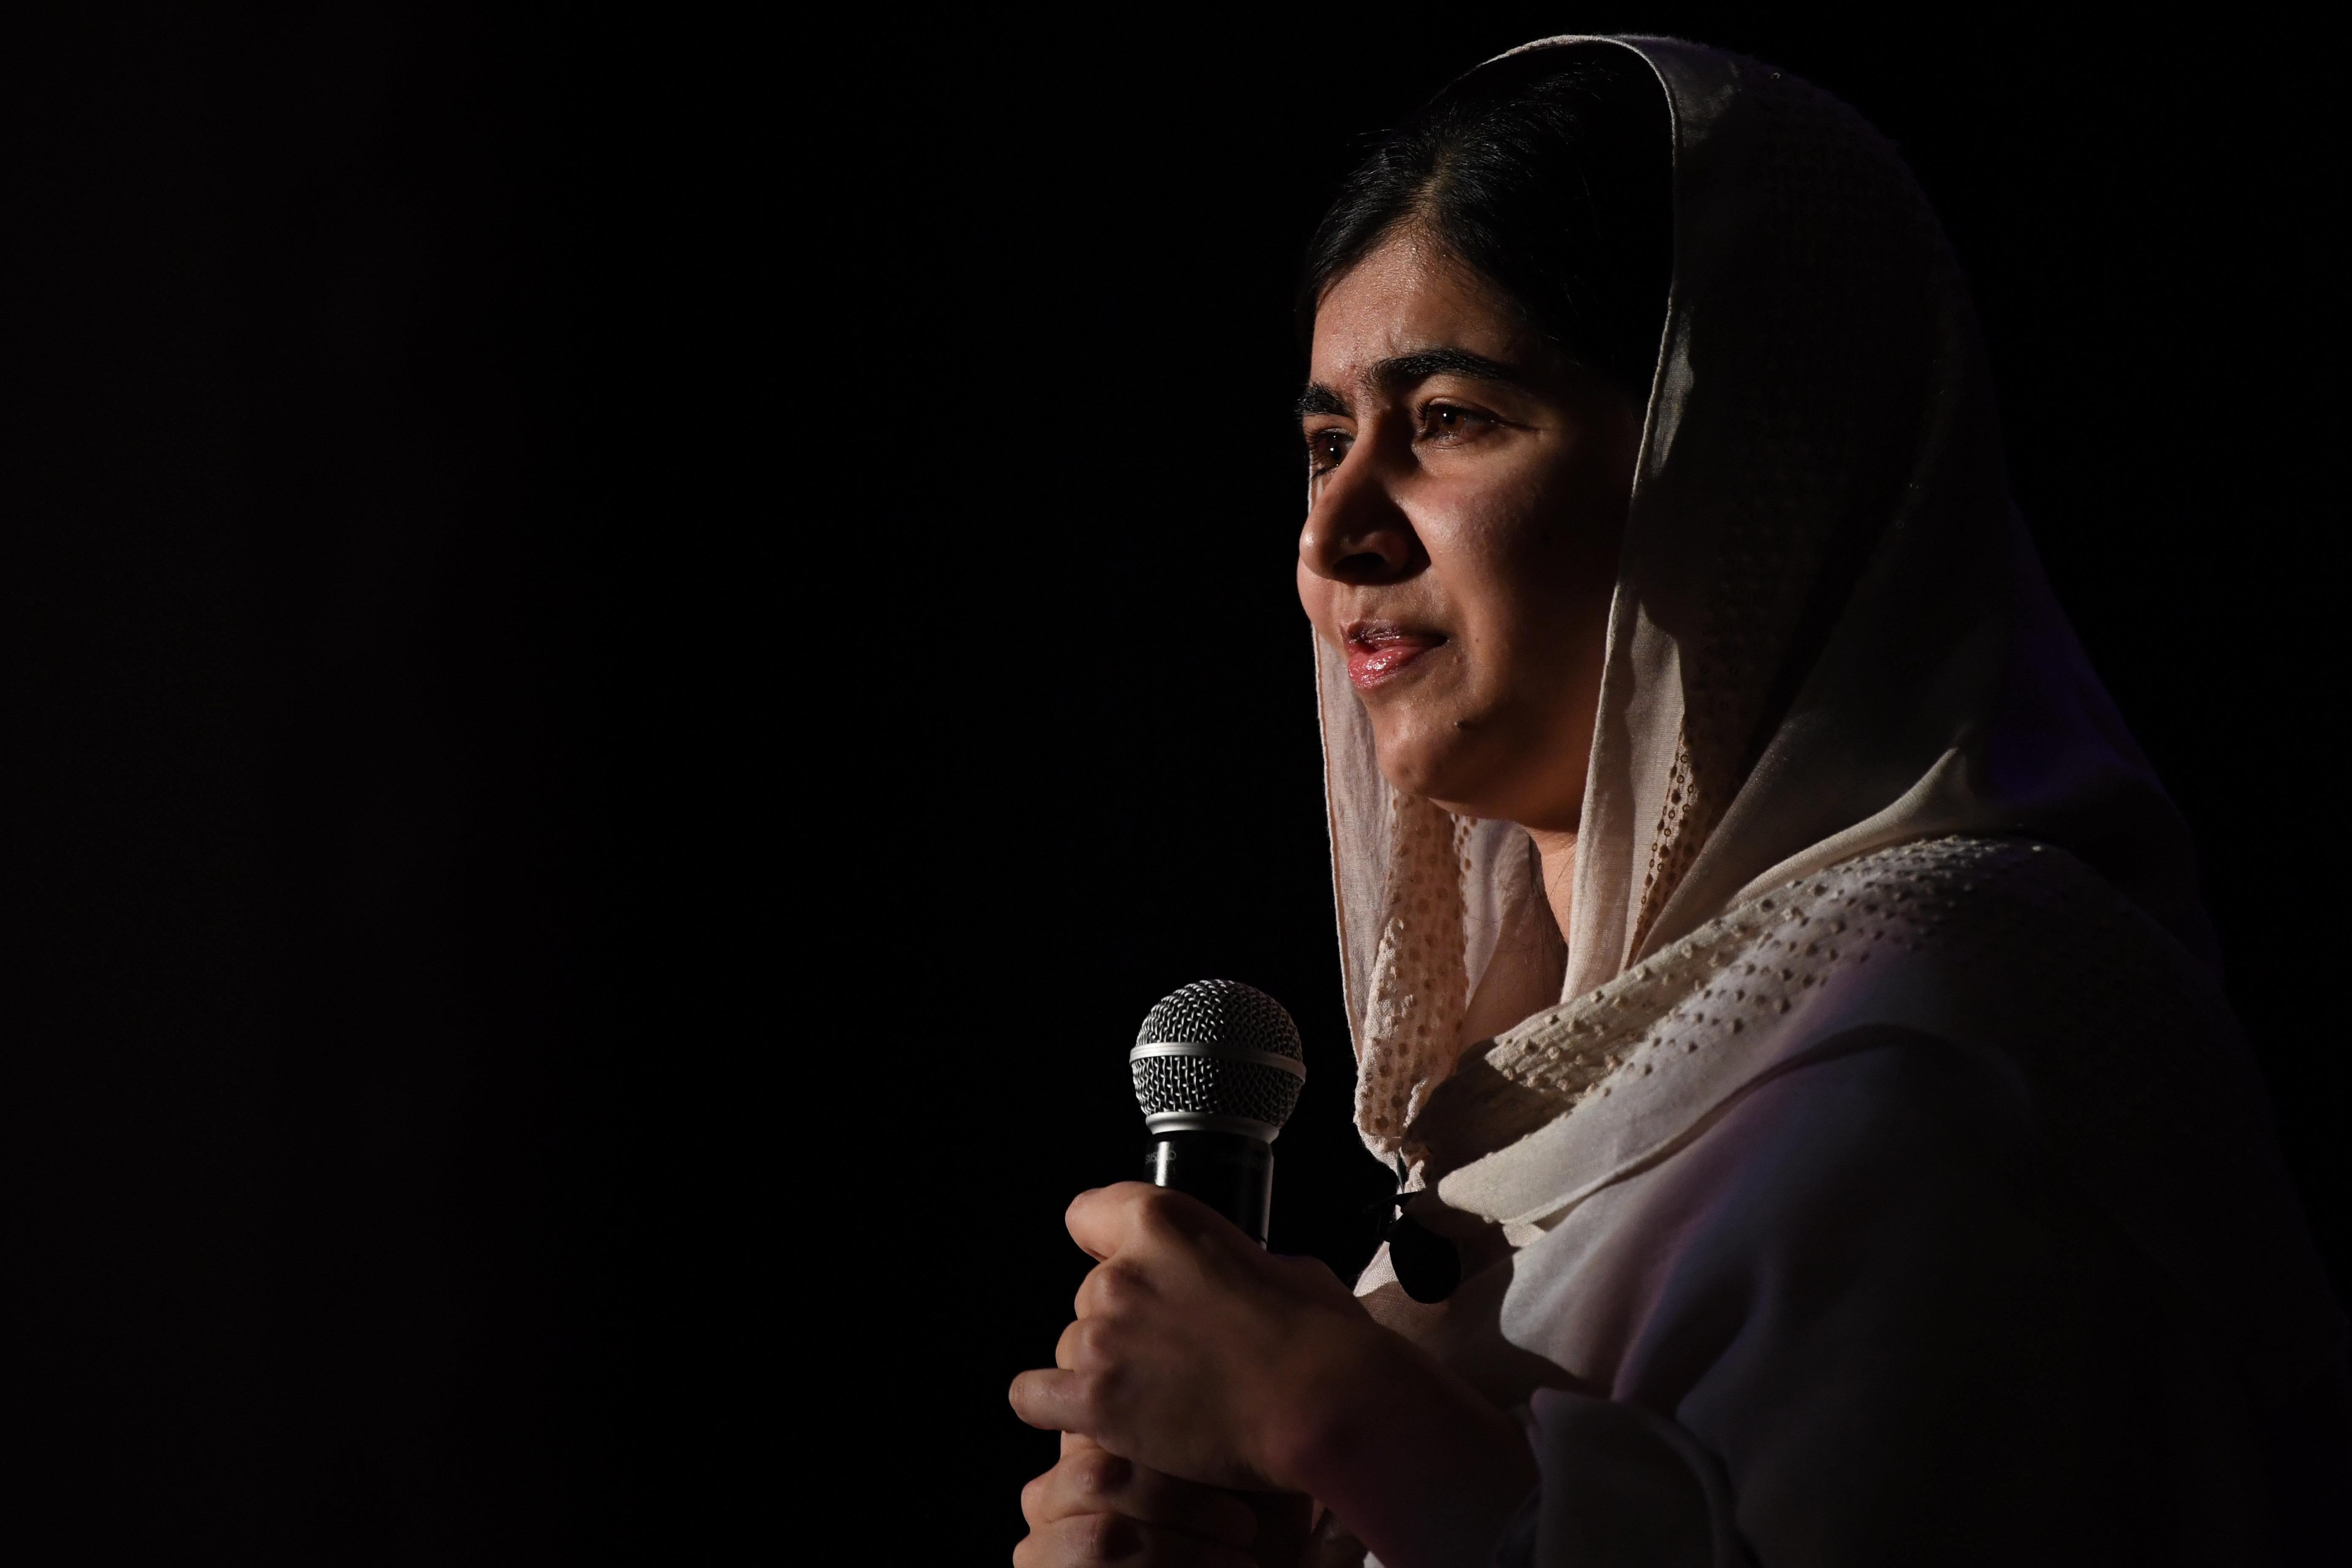 Nobel Peace Prize winner Malala Yousafzai speaks at Denver South High School Friday, October 21, 2016.